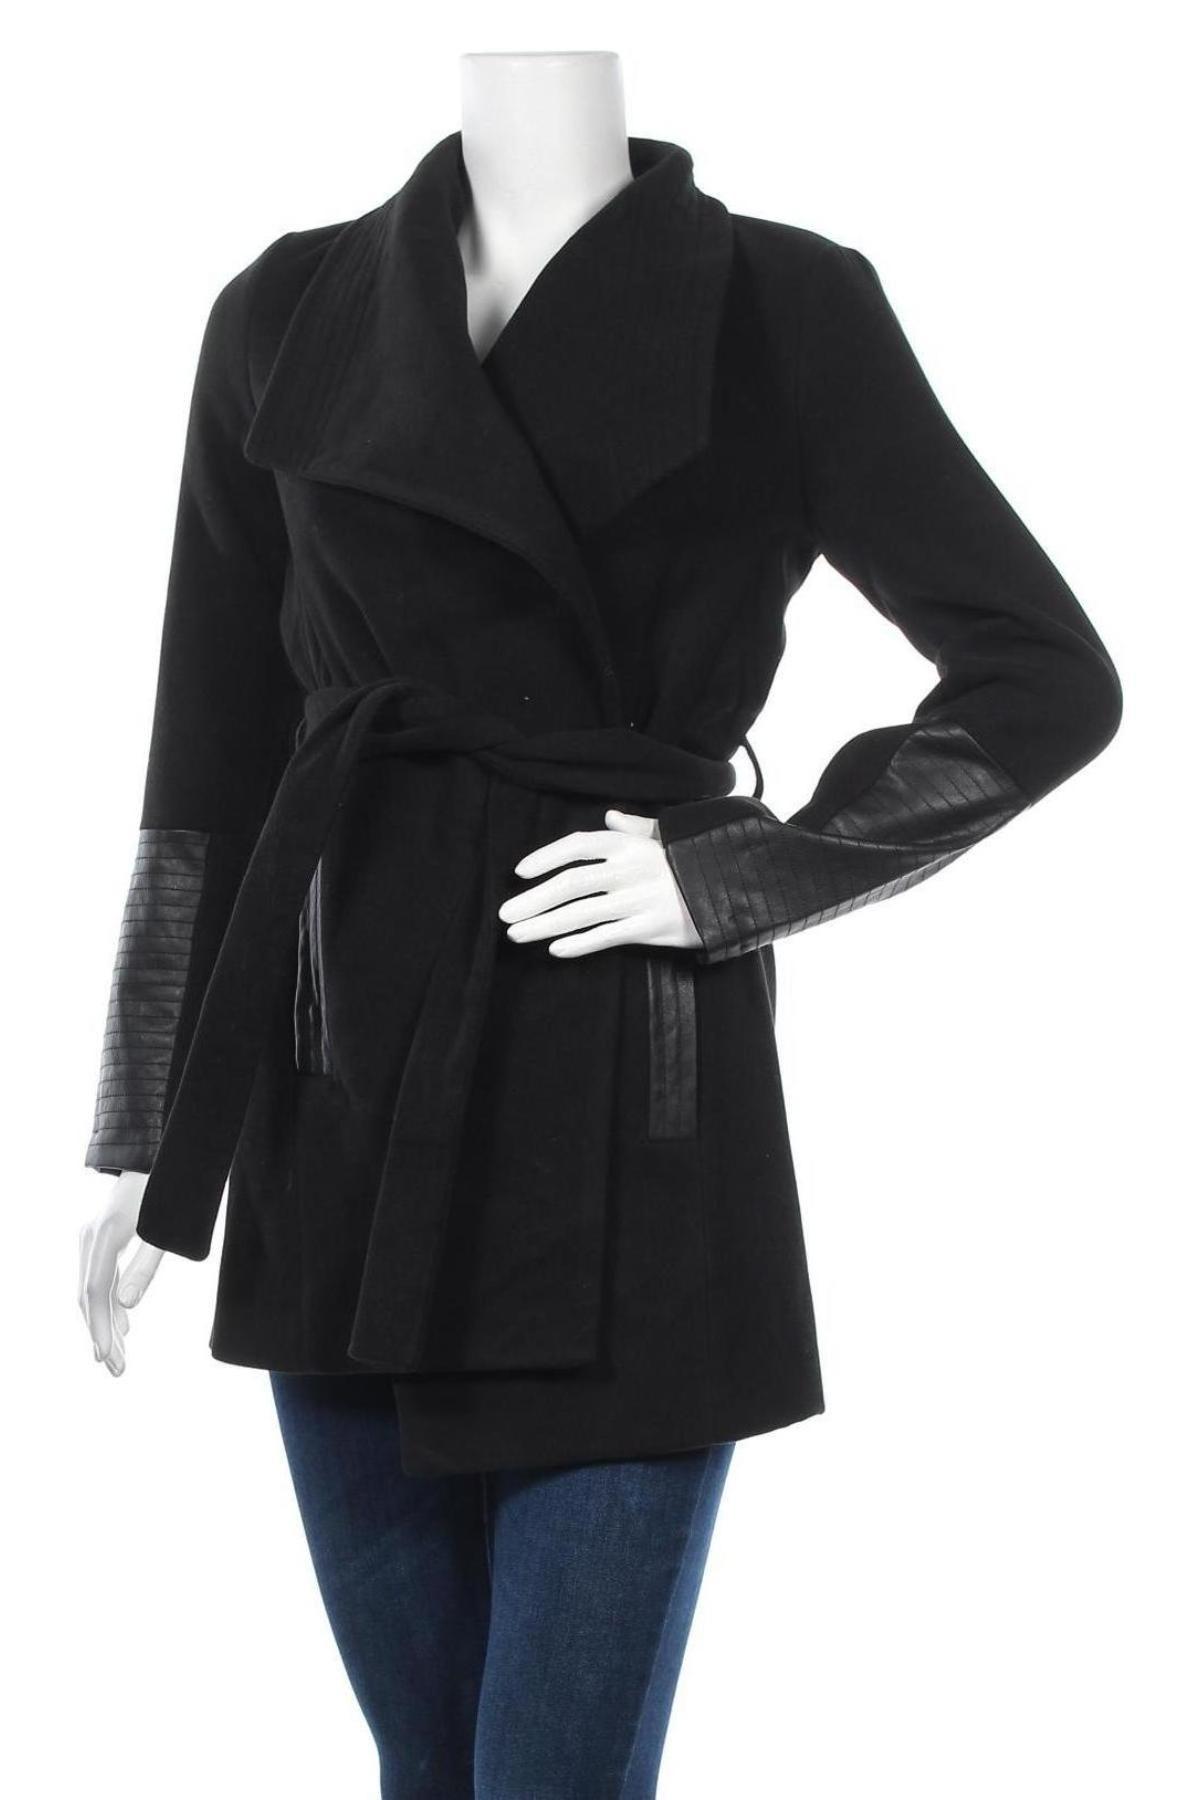 Дамско палто Vero Moda, Размер M, Цвят Черен, 89% полиестер, 10% вискоза, 1% еластан, Цена 48,48лв.